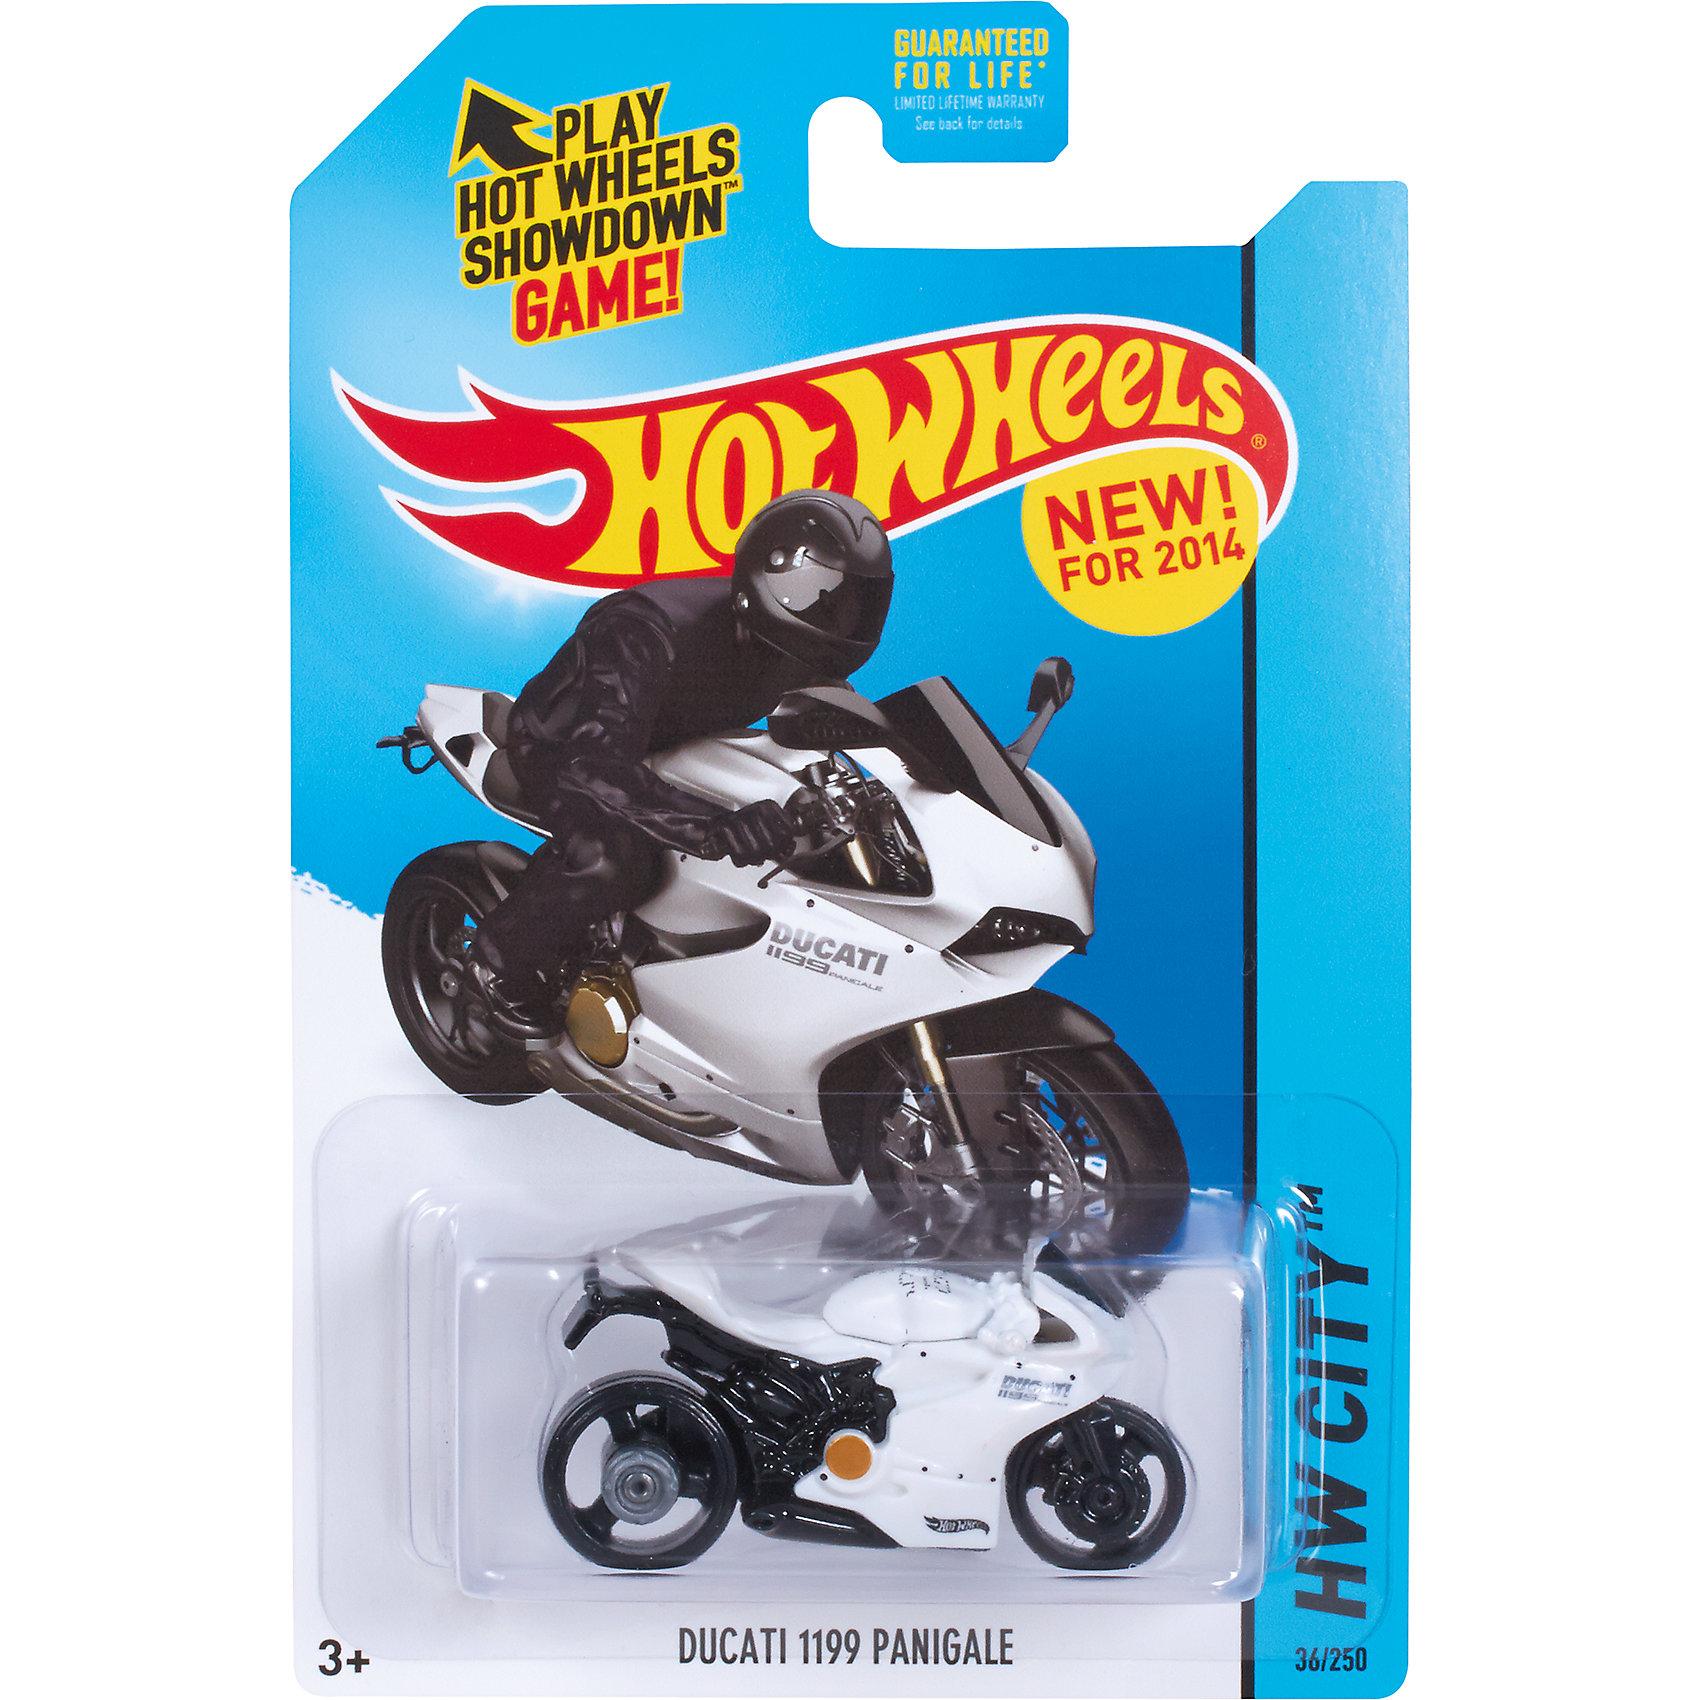 Базовая машинка Hot Wheels, Ducati 1199 PanigaleМашинки<br><br><br>Ширина мм: 110<br>Глубина мм: 45<br>Высота мм: 110<br>Вес г: 30<br>Возраст от месяцев: 36<br>Возраст до месяцев: 96<br>Пол: Мужской<br>Возраст: Детский<br>SKU: 7111920